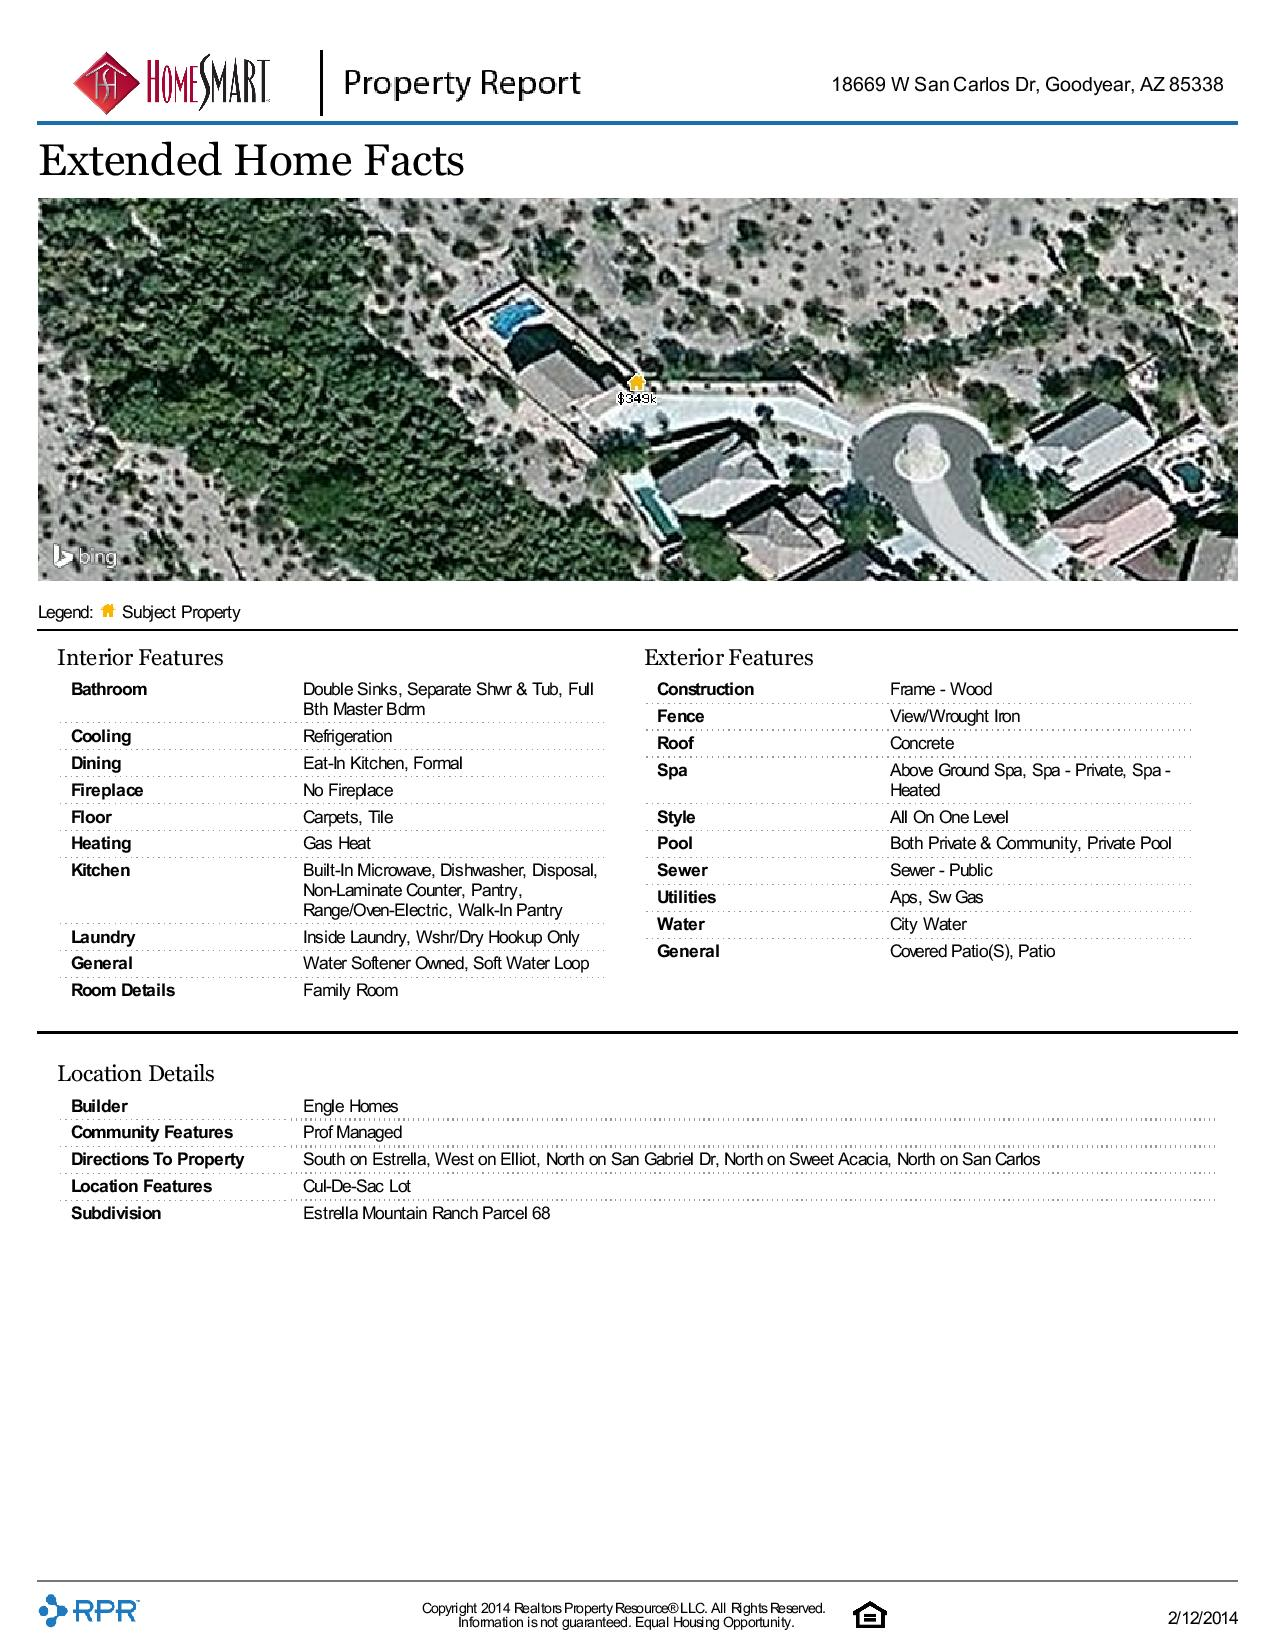 18669-W-San-Carlos-Dr-Goodyear-AZ-85338-page-004